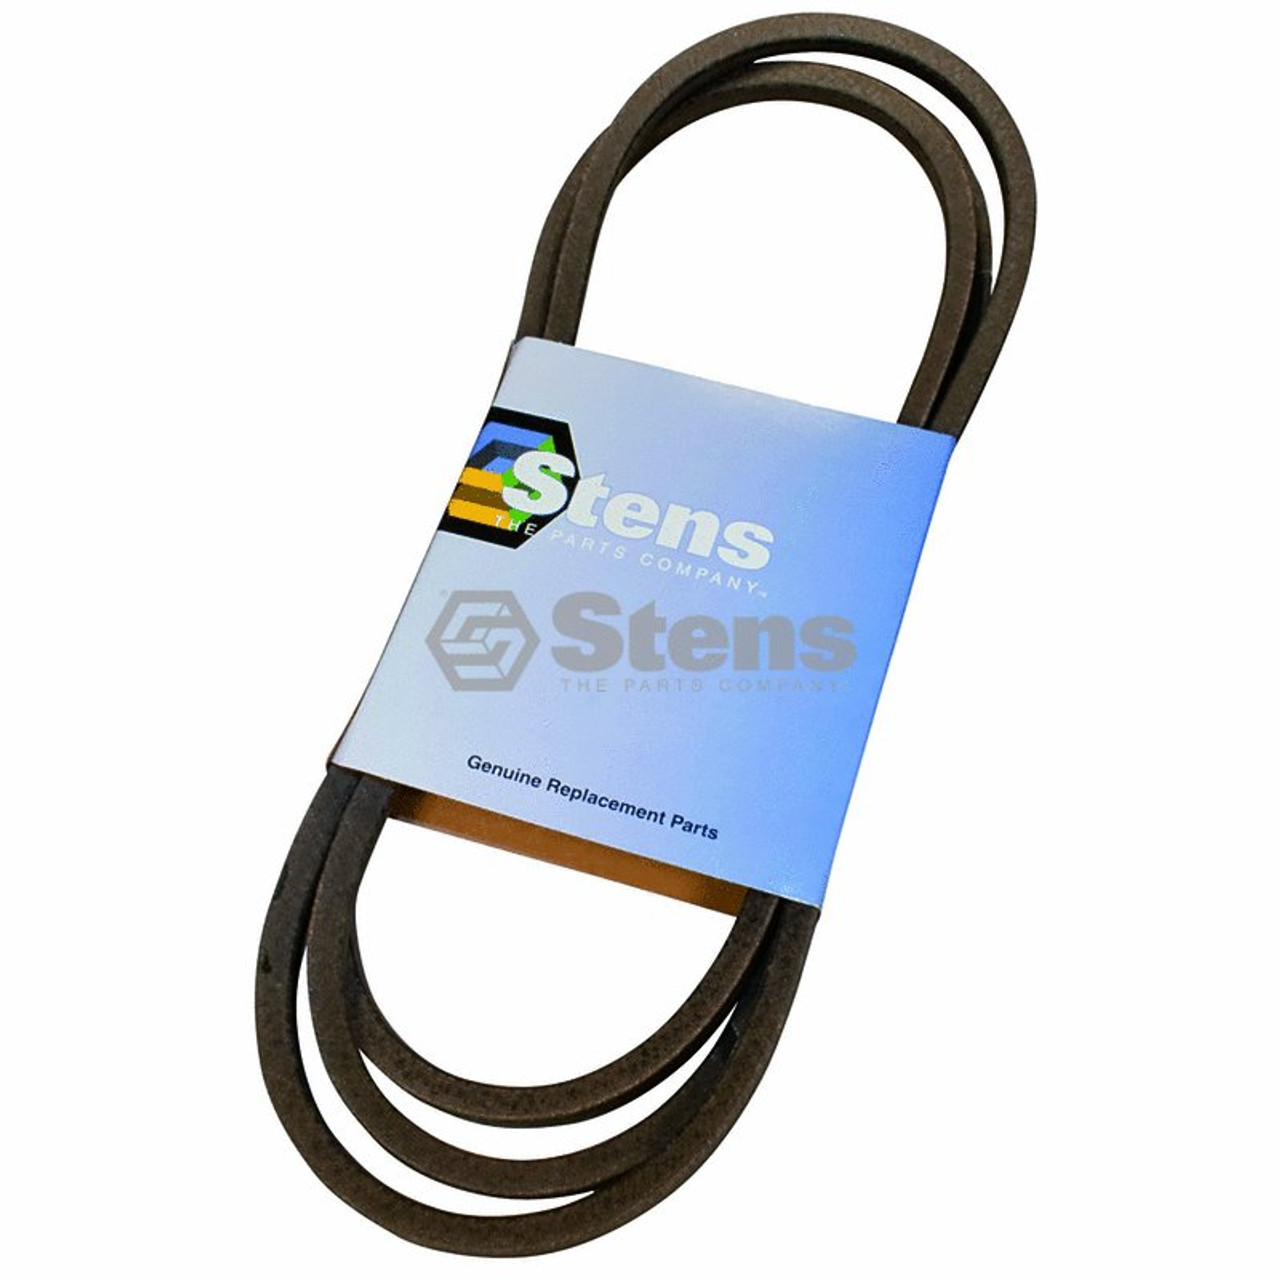 Stens 265-221 OEM Replacement Belt MTD Cub Cadet Victa 754-0266 954-0266A